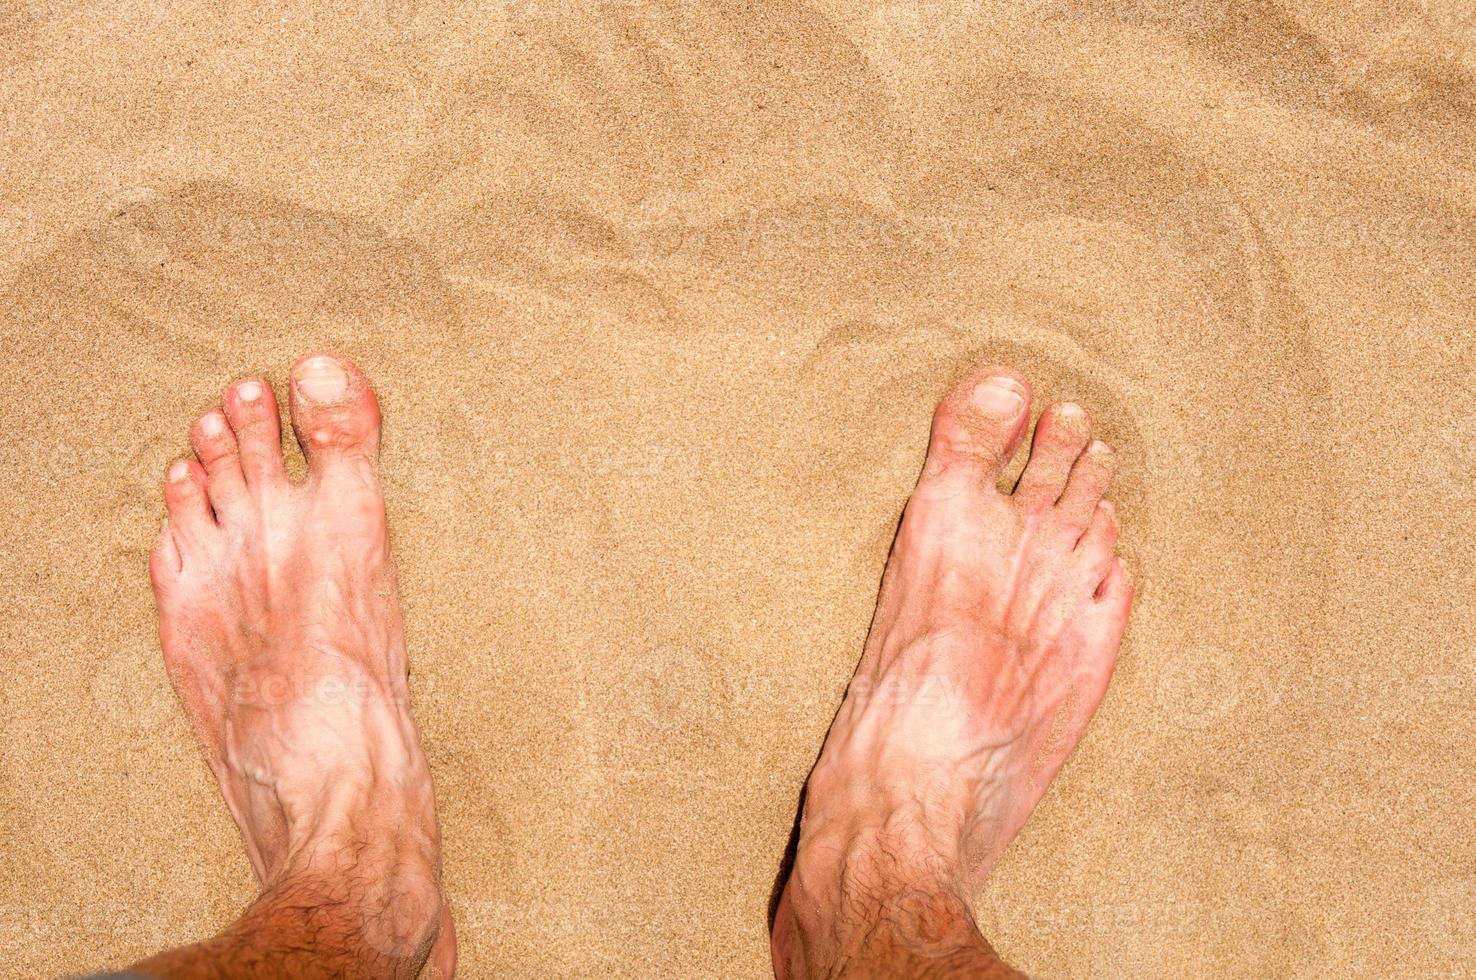 pie masculino en la arena foto